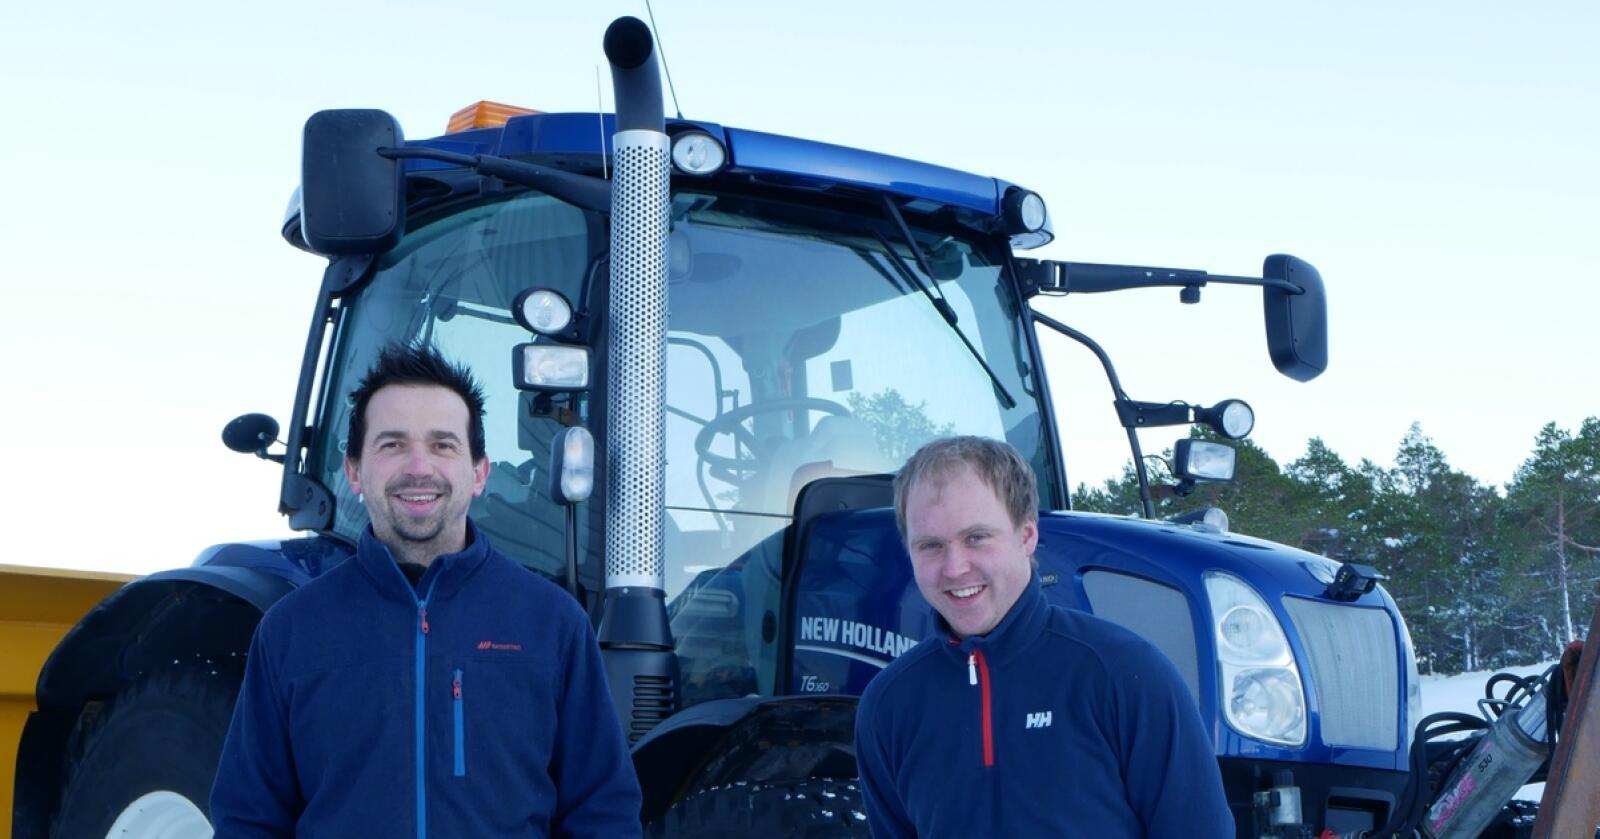 Nyetablering: Selger Åge Thoresen og Mekaniker Aksel Nerhus er med fra starten  på den nye avdelingen i Vestnes